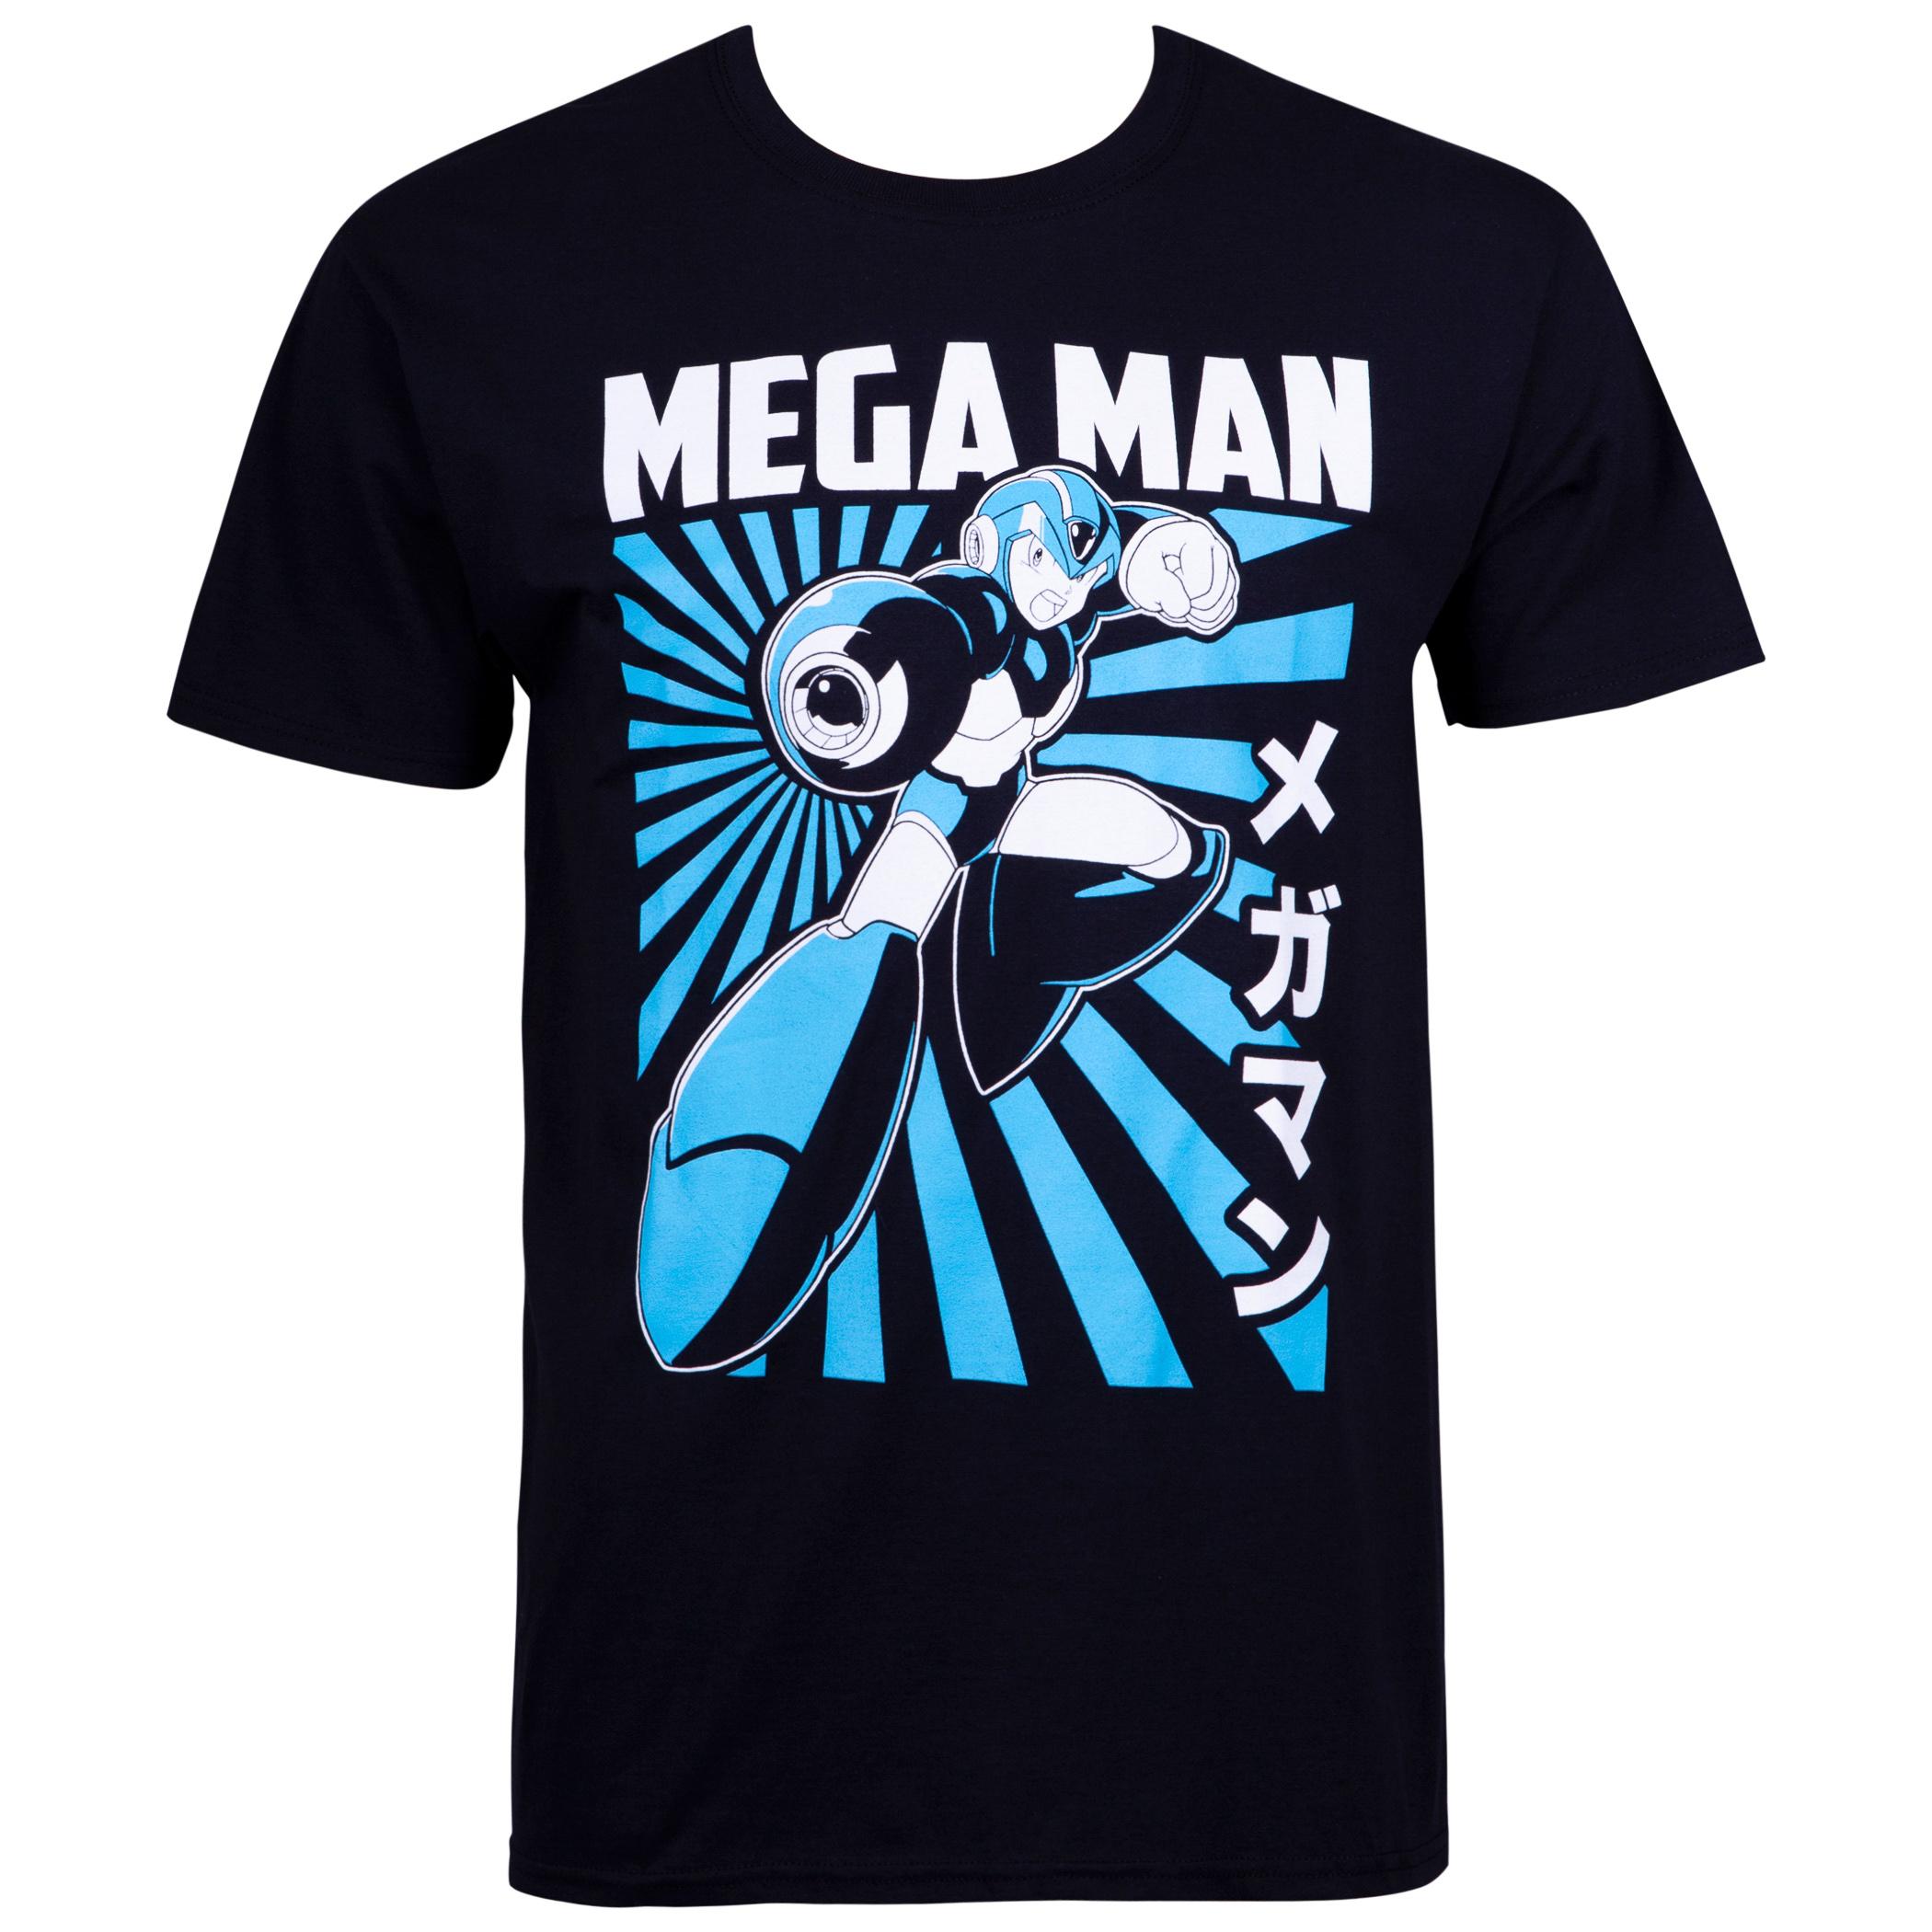 Mega Man Kanji Portrait Black Tee Shirt